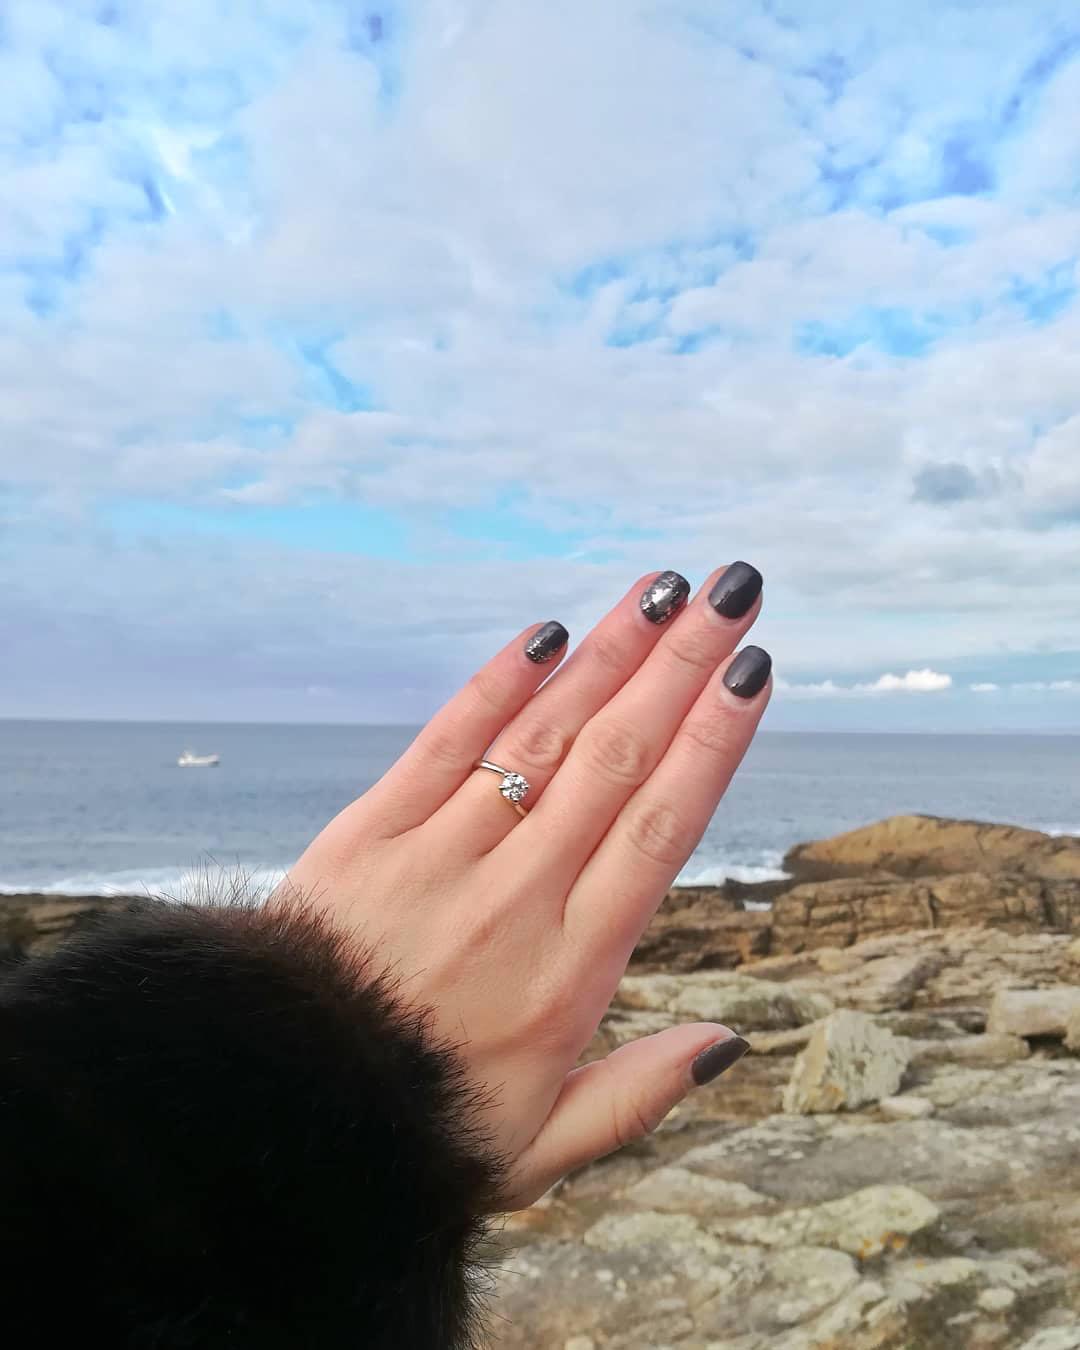 engagement ring selfie rocky ocean view